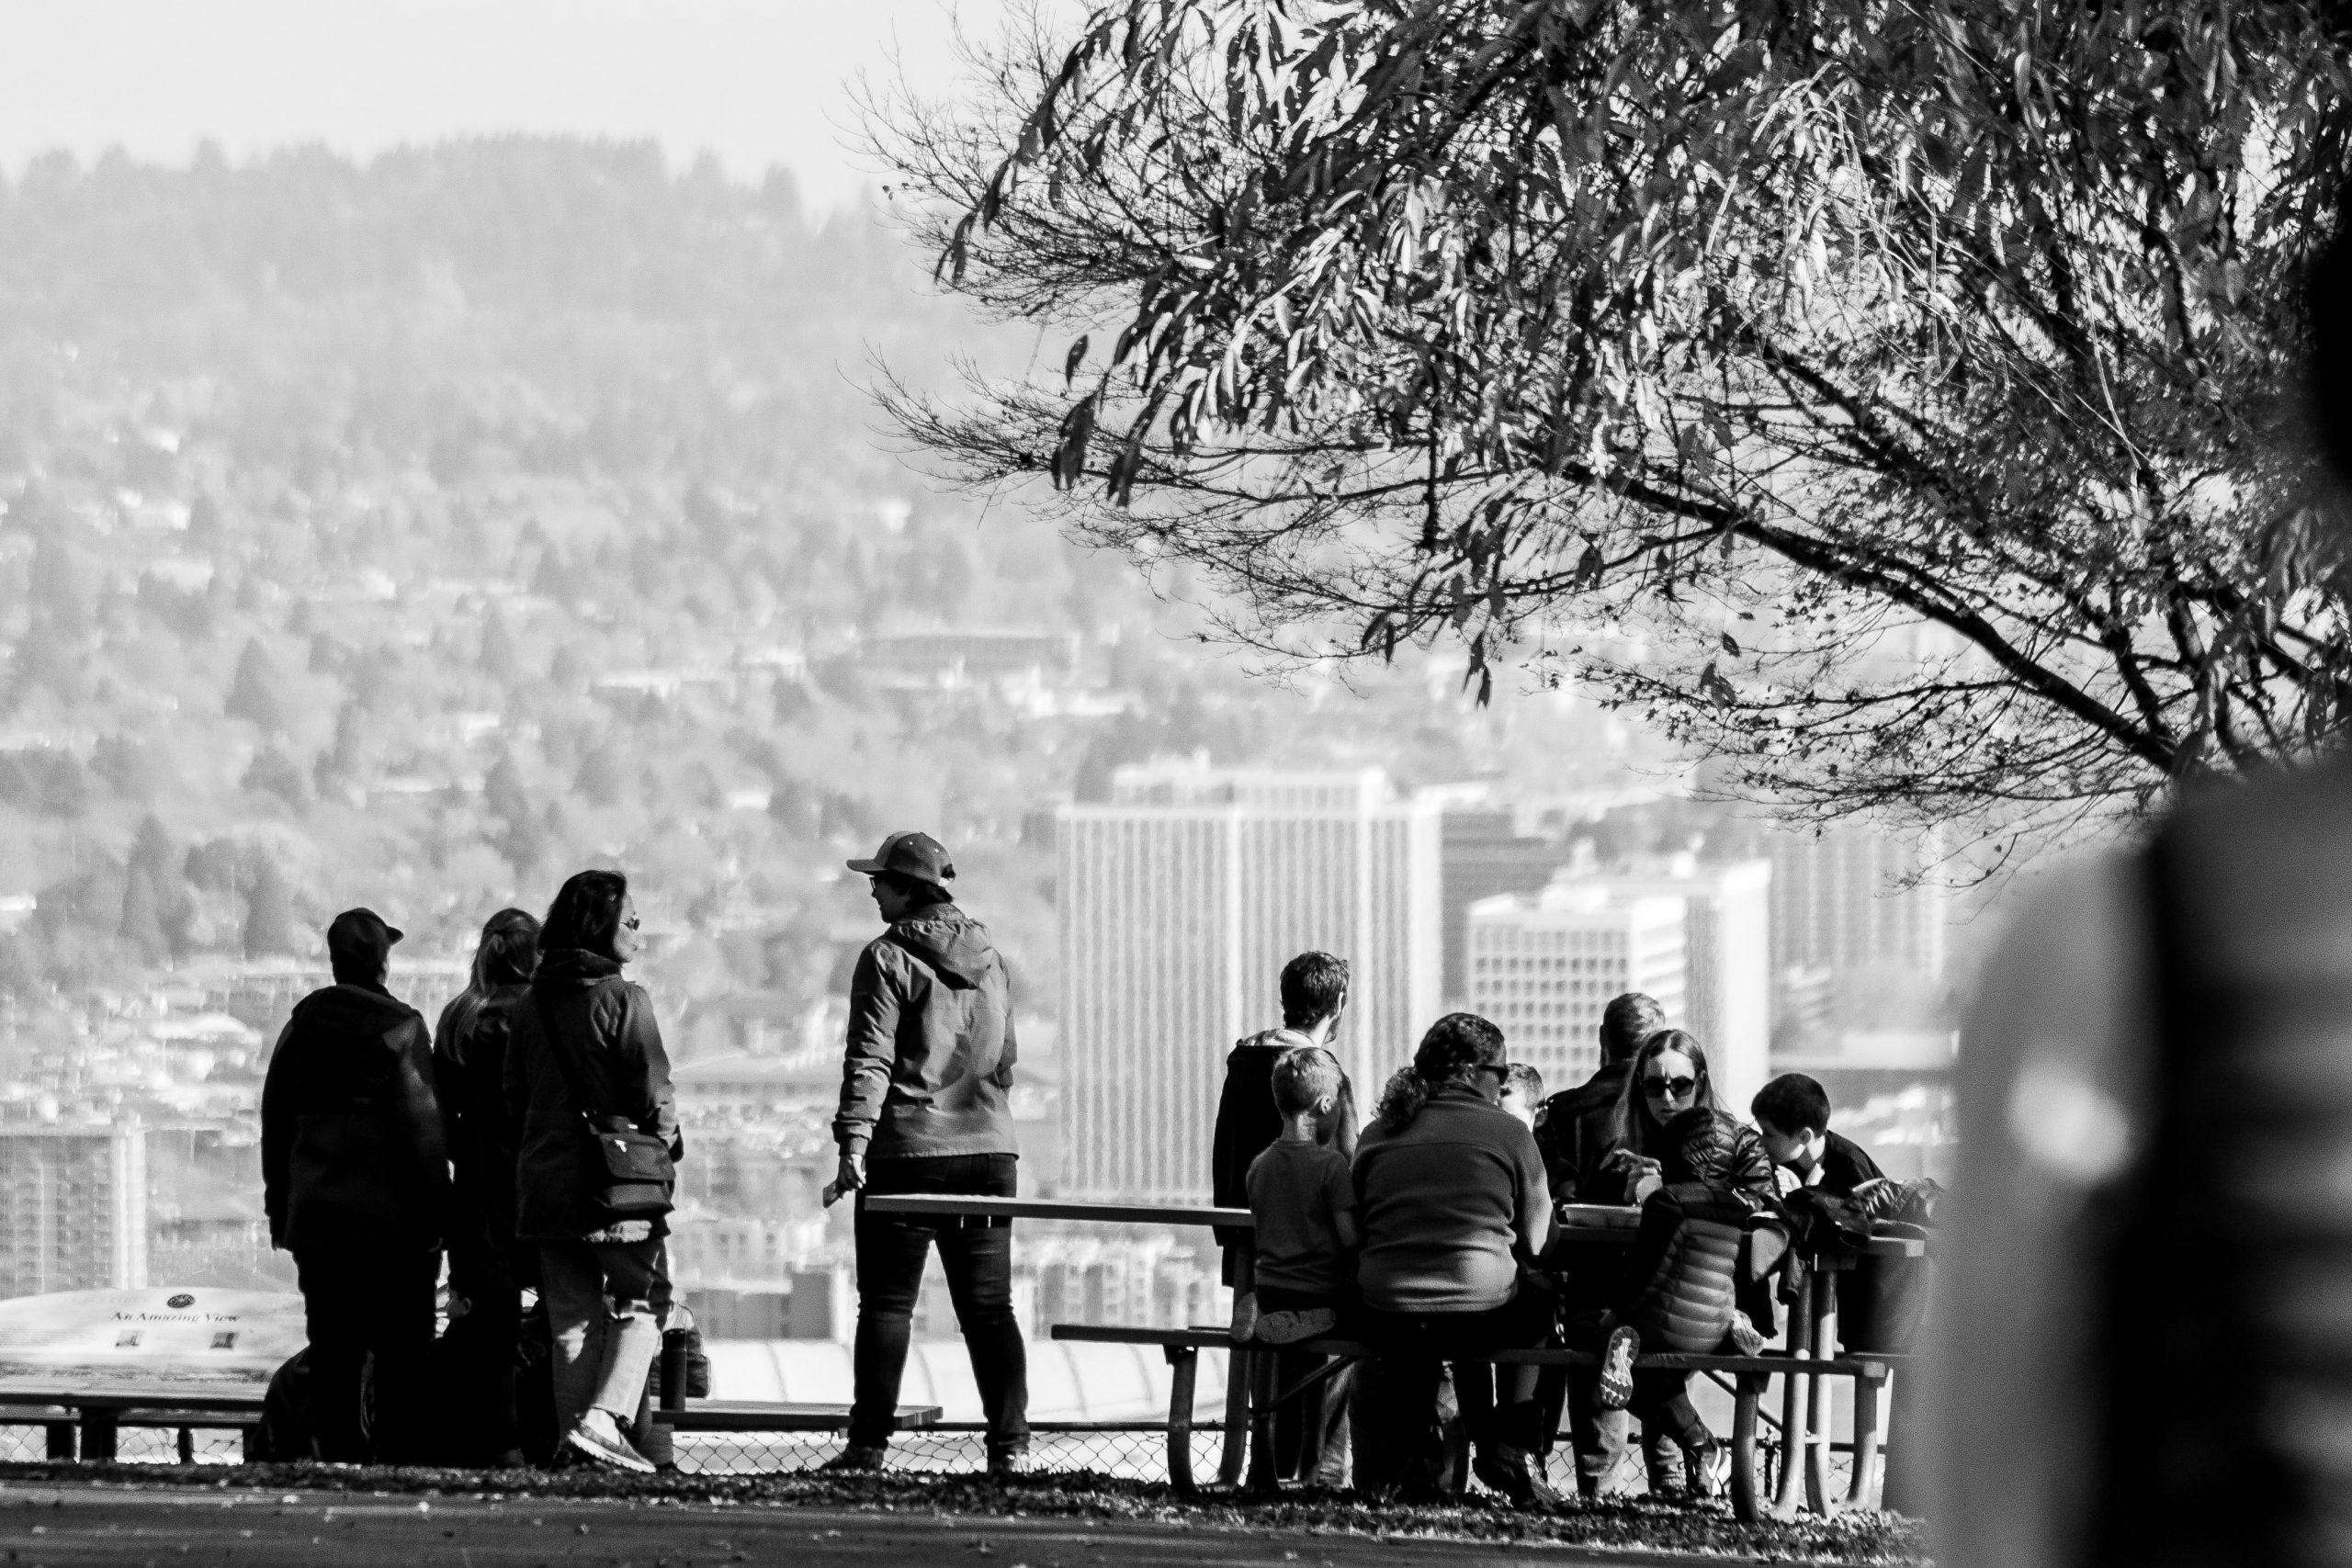 people sitting under trees near buildings